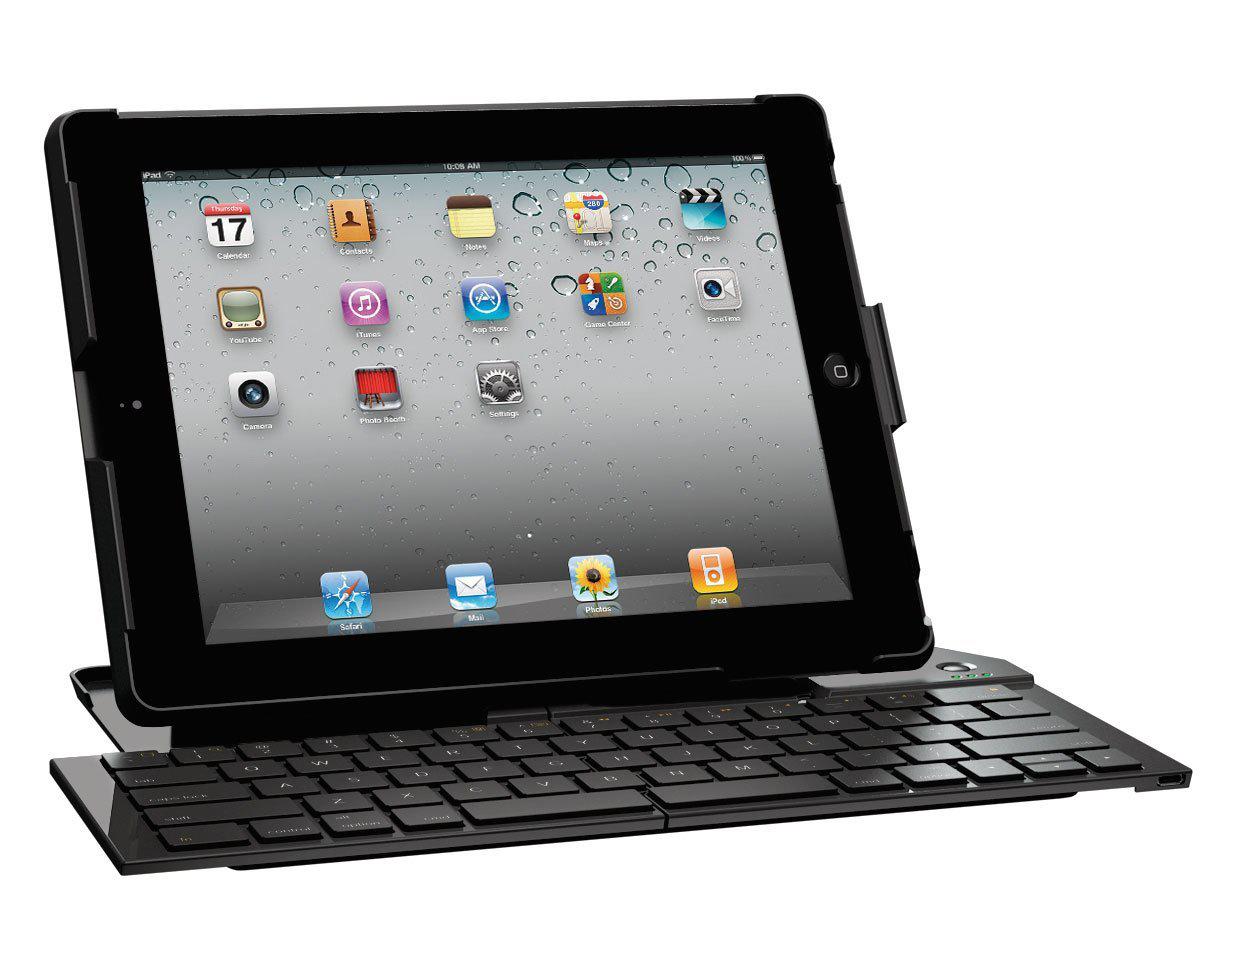 Logitech Foldable Keyboard Clavier pliable - compatible iPad 2/3/4